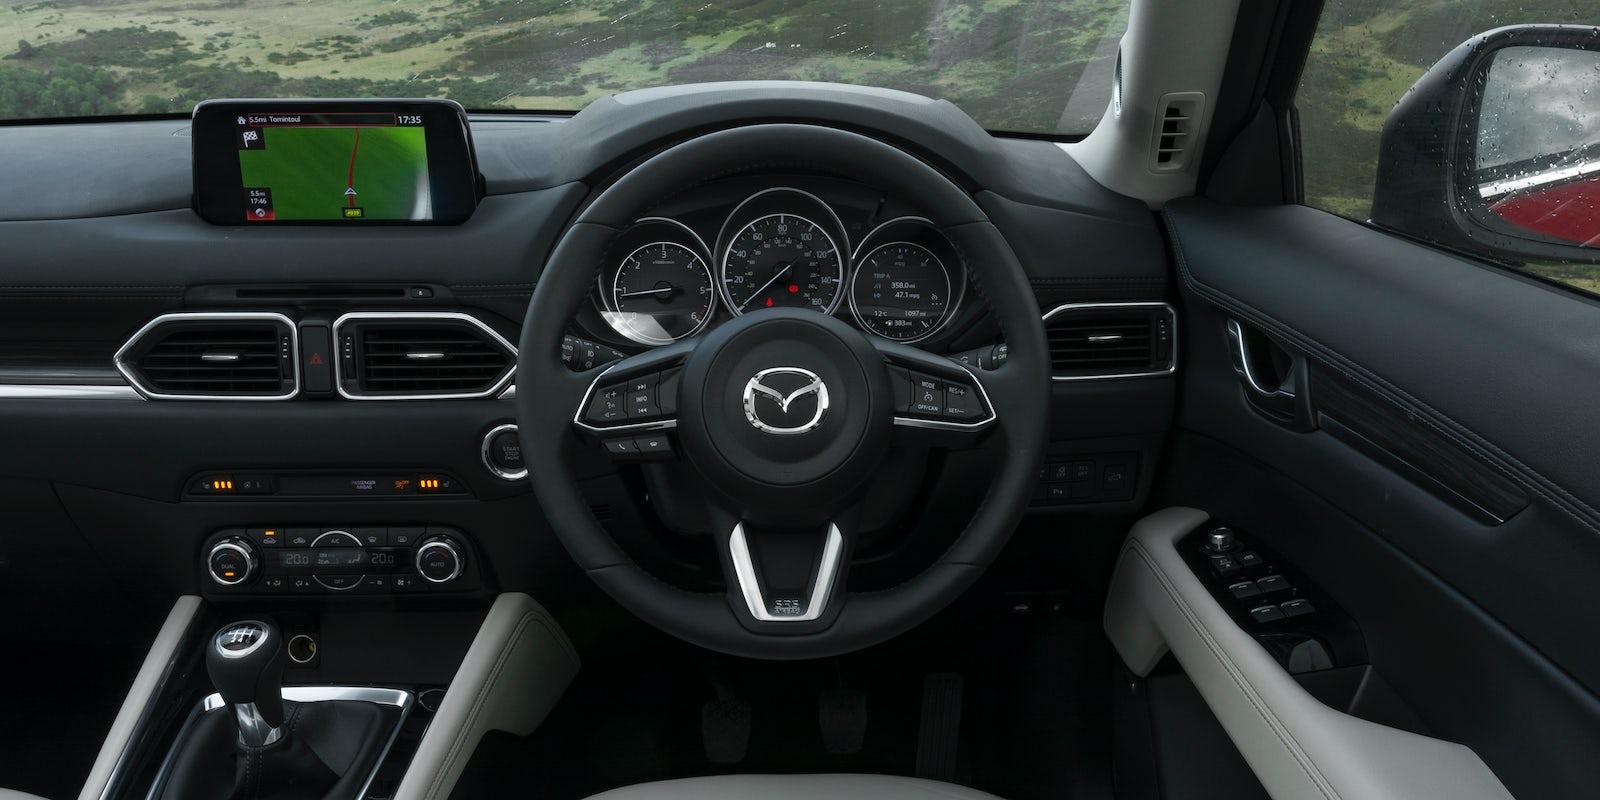 Mazda Cx 5 Interior Amp Infotainment Carwow